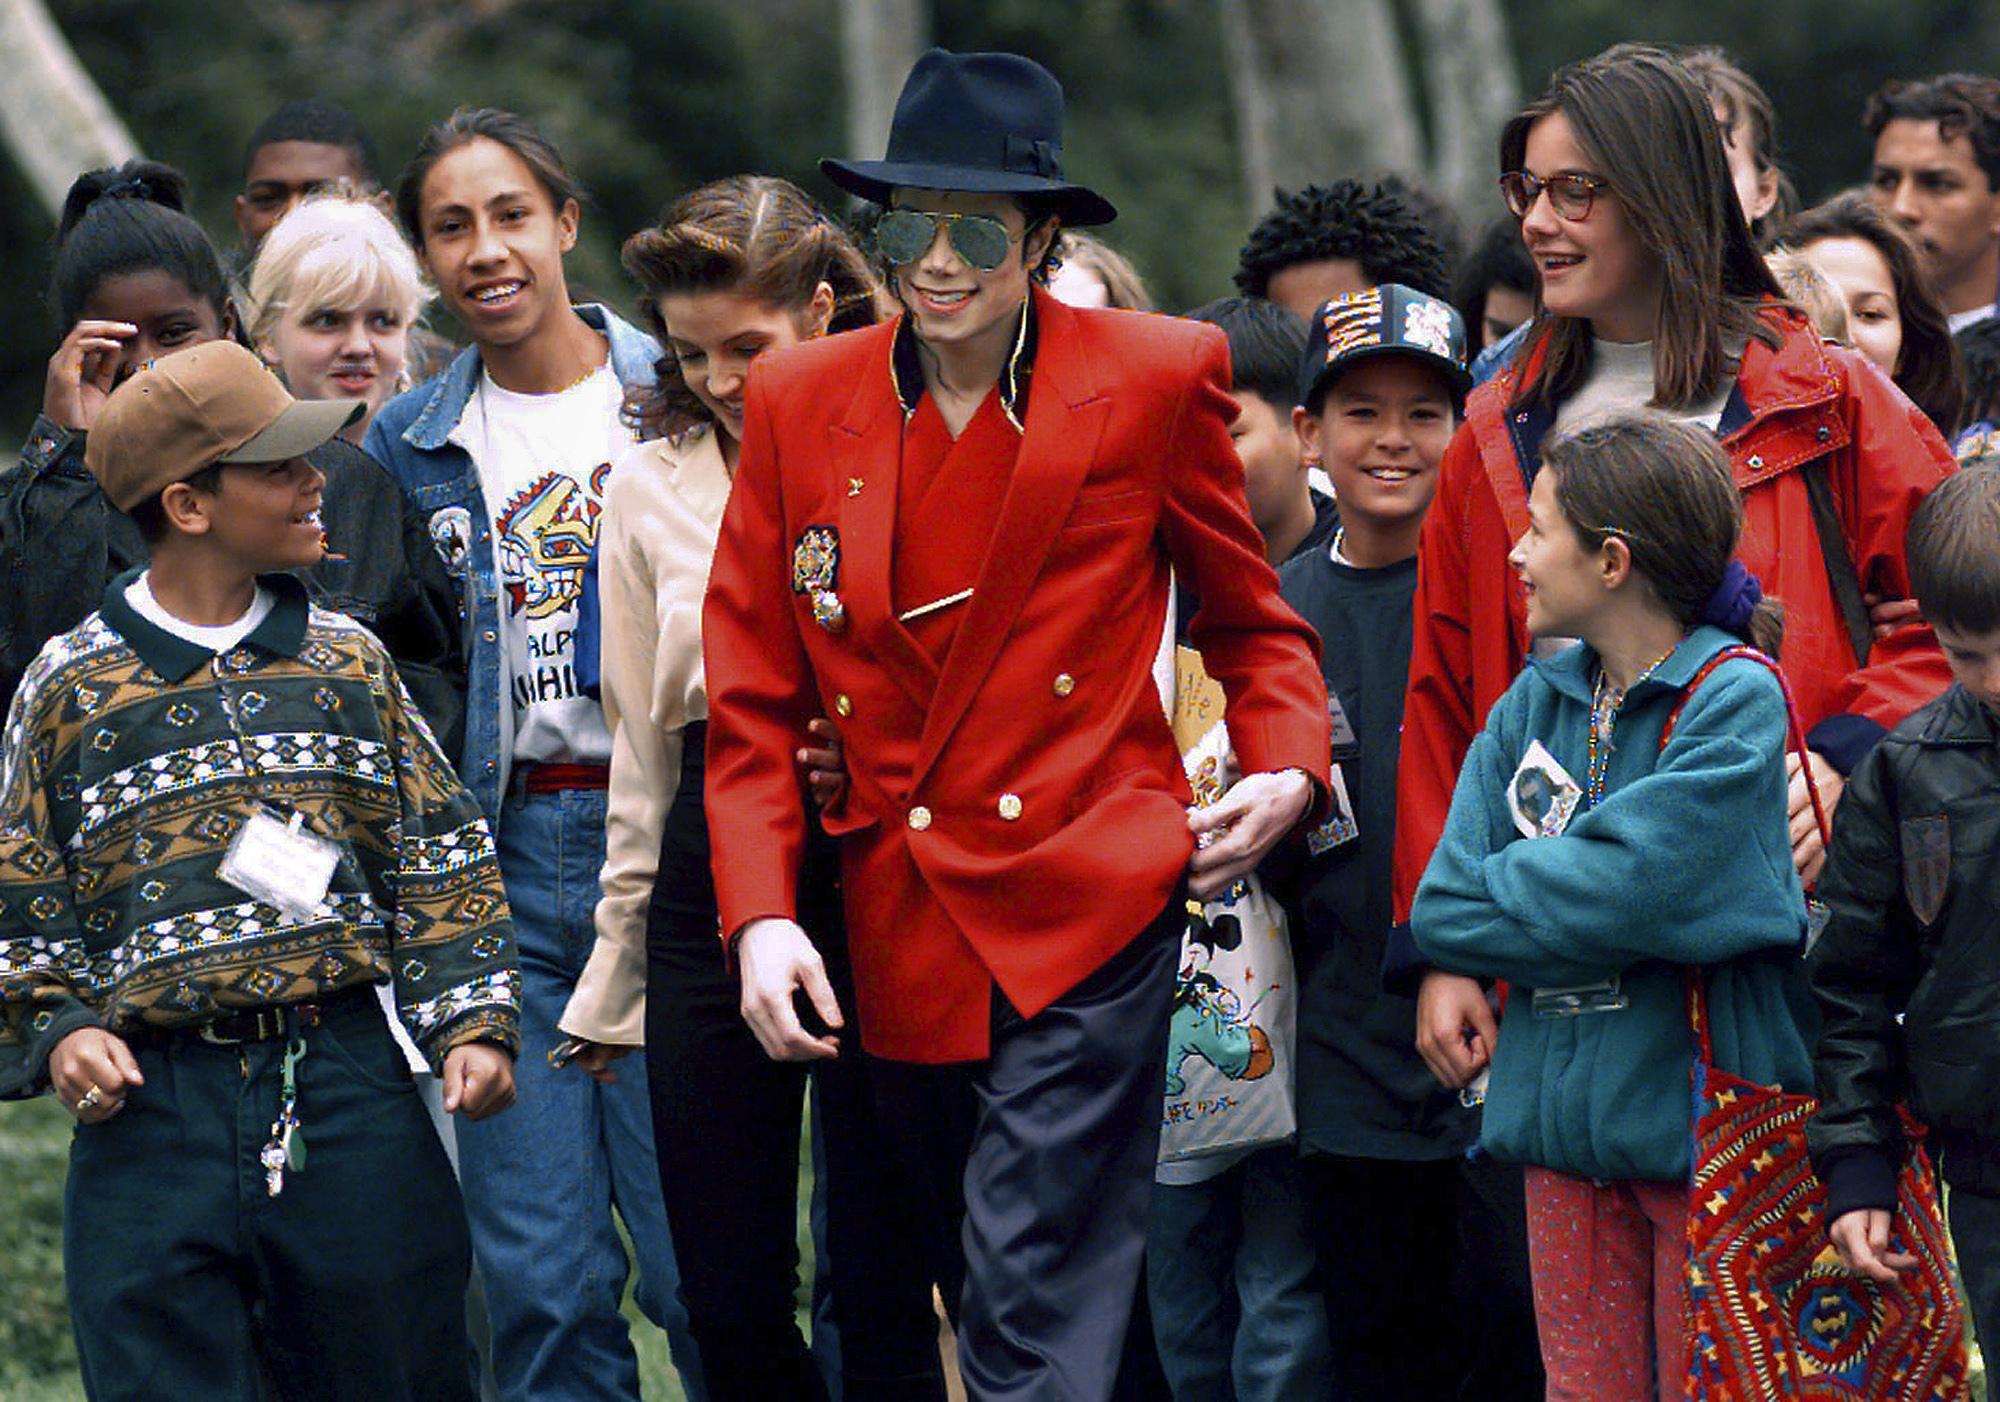 Michael_Jackson_Documentary_95861-159532.jpg43135412